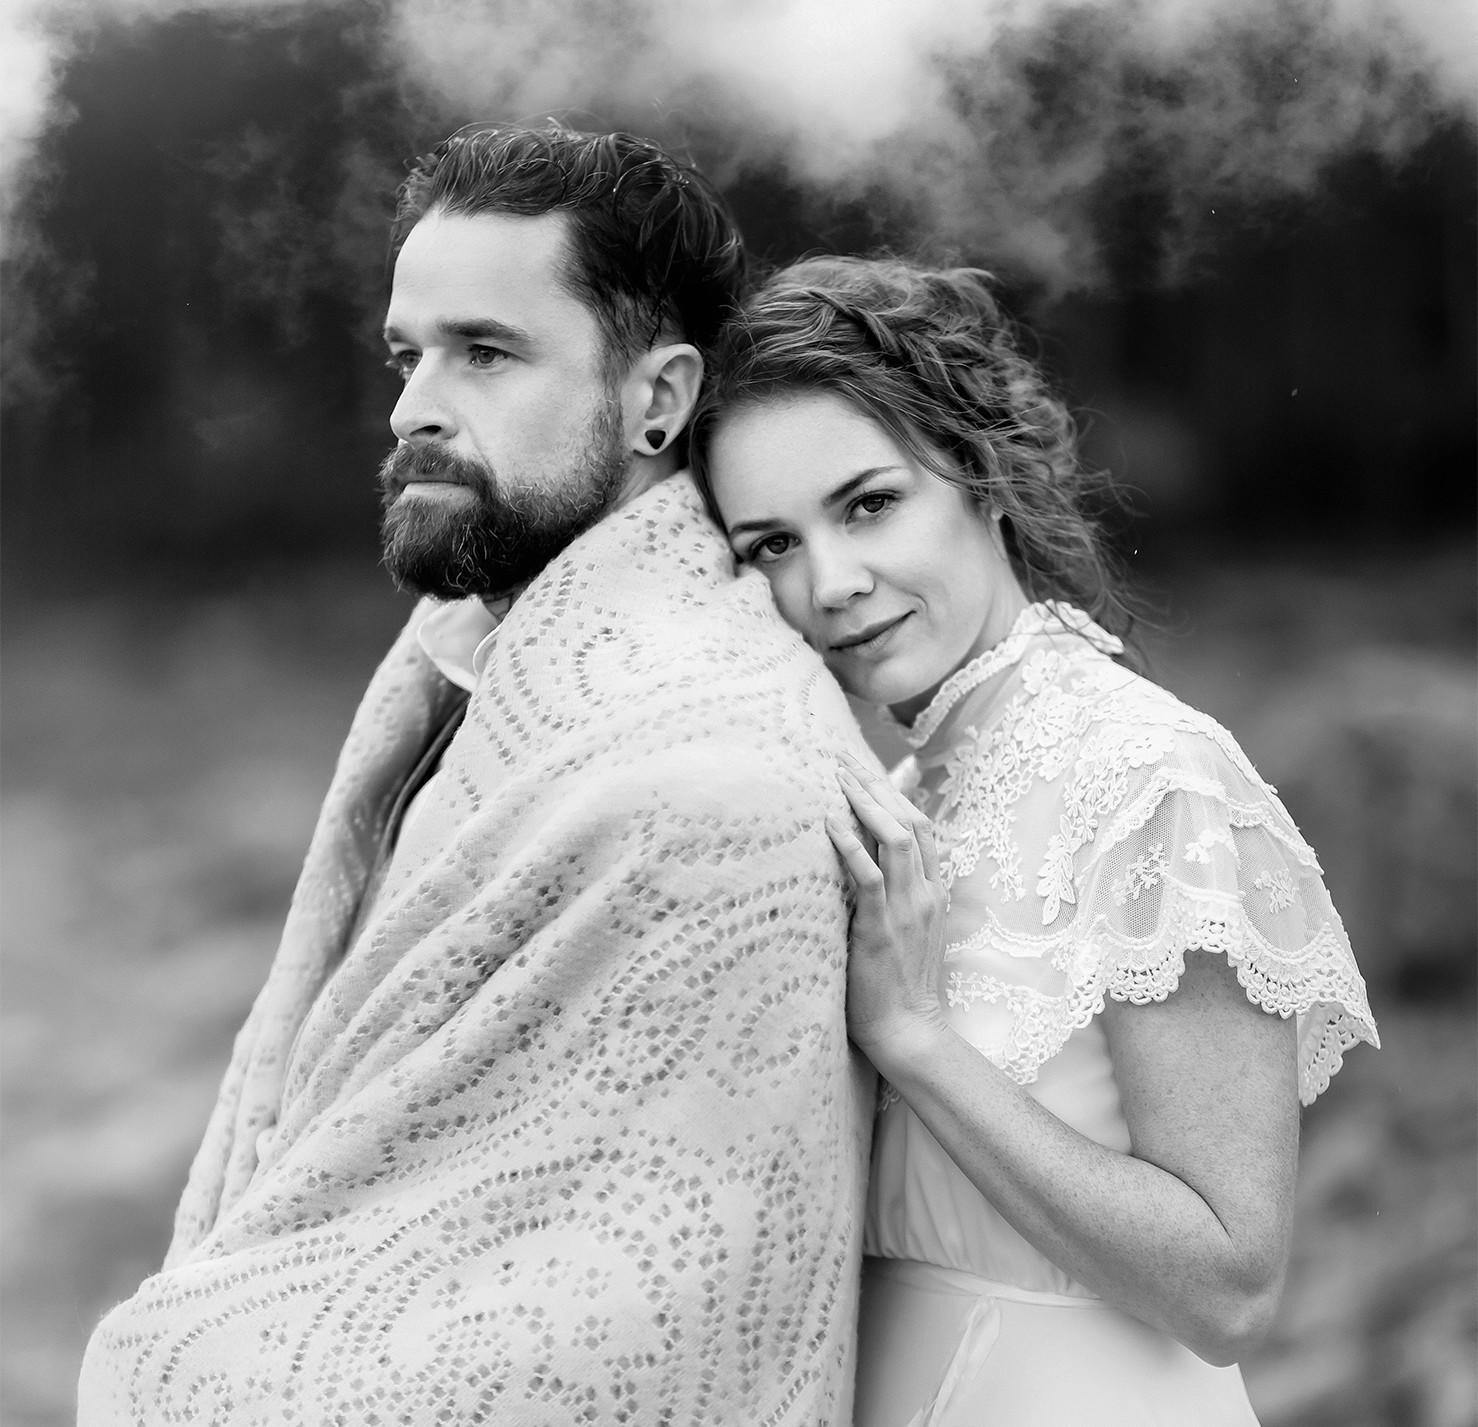 Aaron Patrick and Alissa King